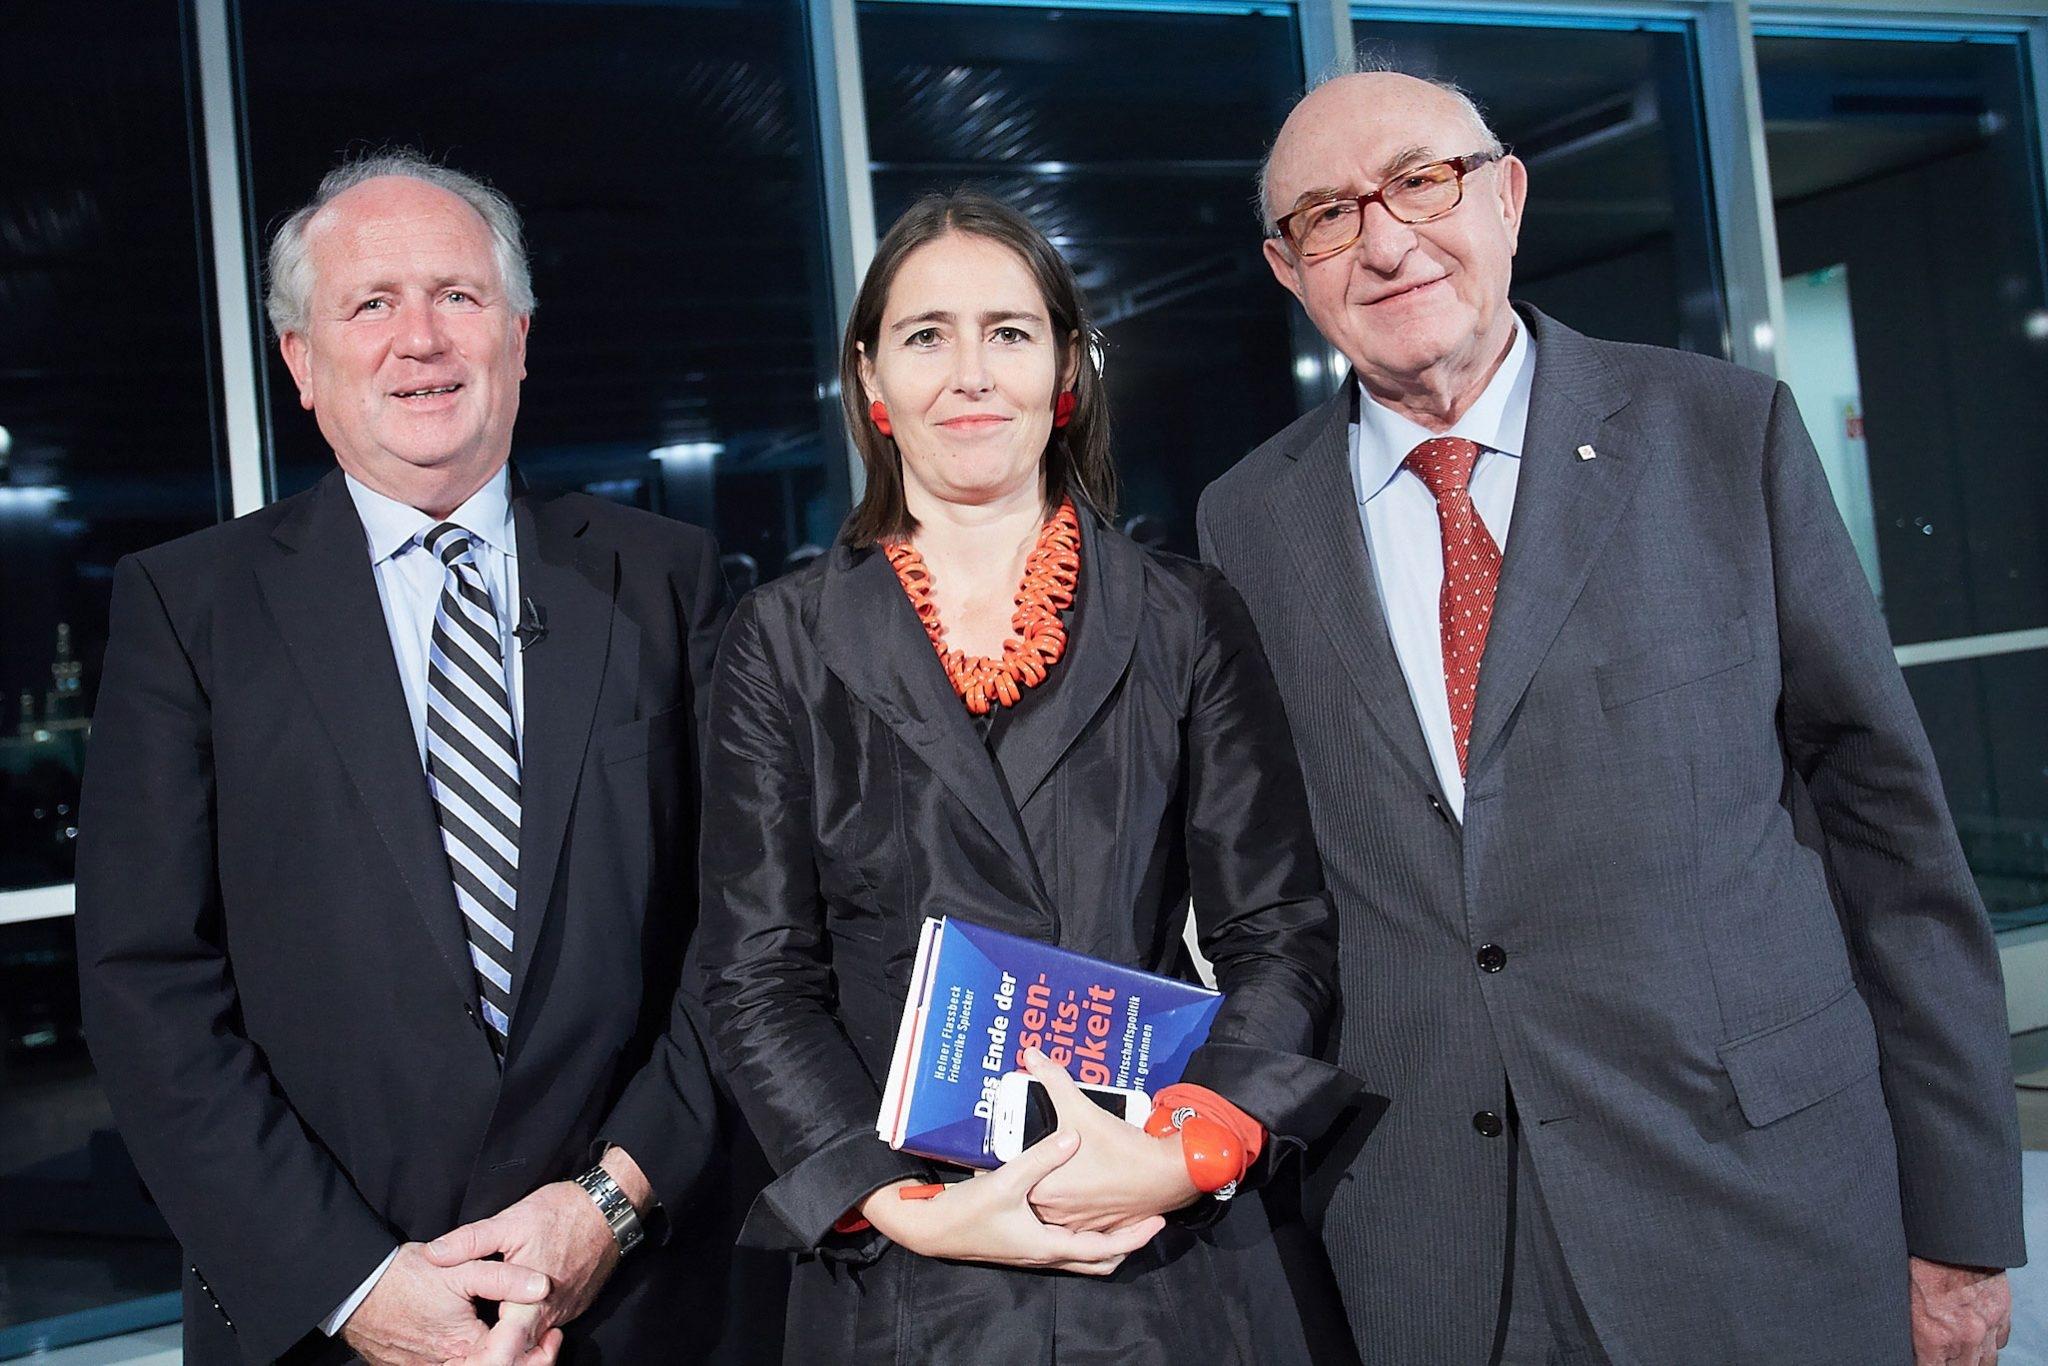 "Am Bild v.l.n.r.: Prof. Dr. Heiner Flassbeck (Ökonom), Dr. Alexandra Föderl-Schmid (Chefredakteurin ""Der Standard"